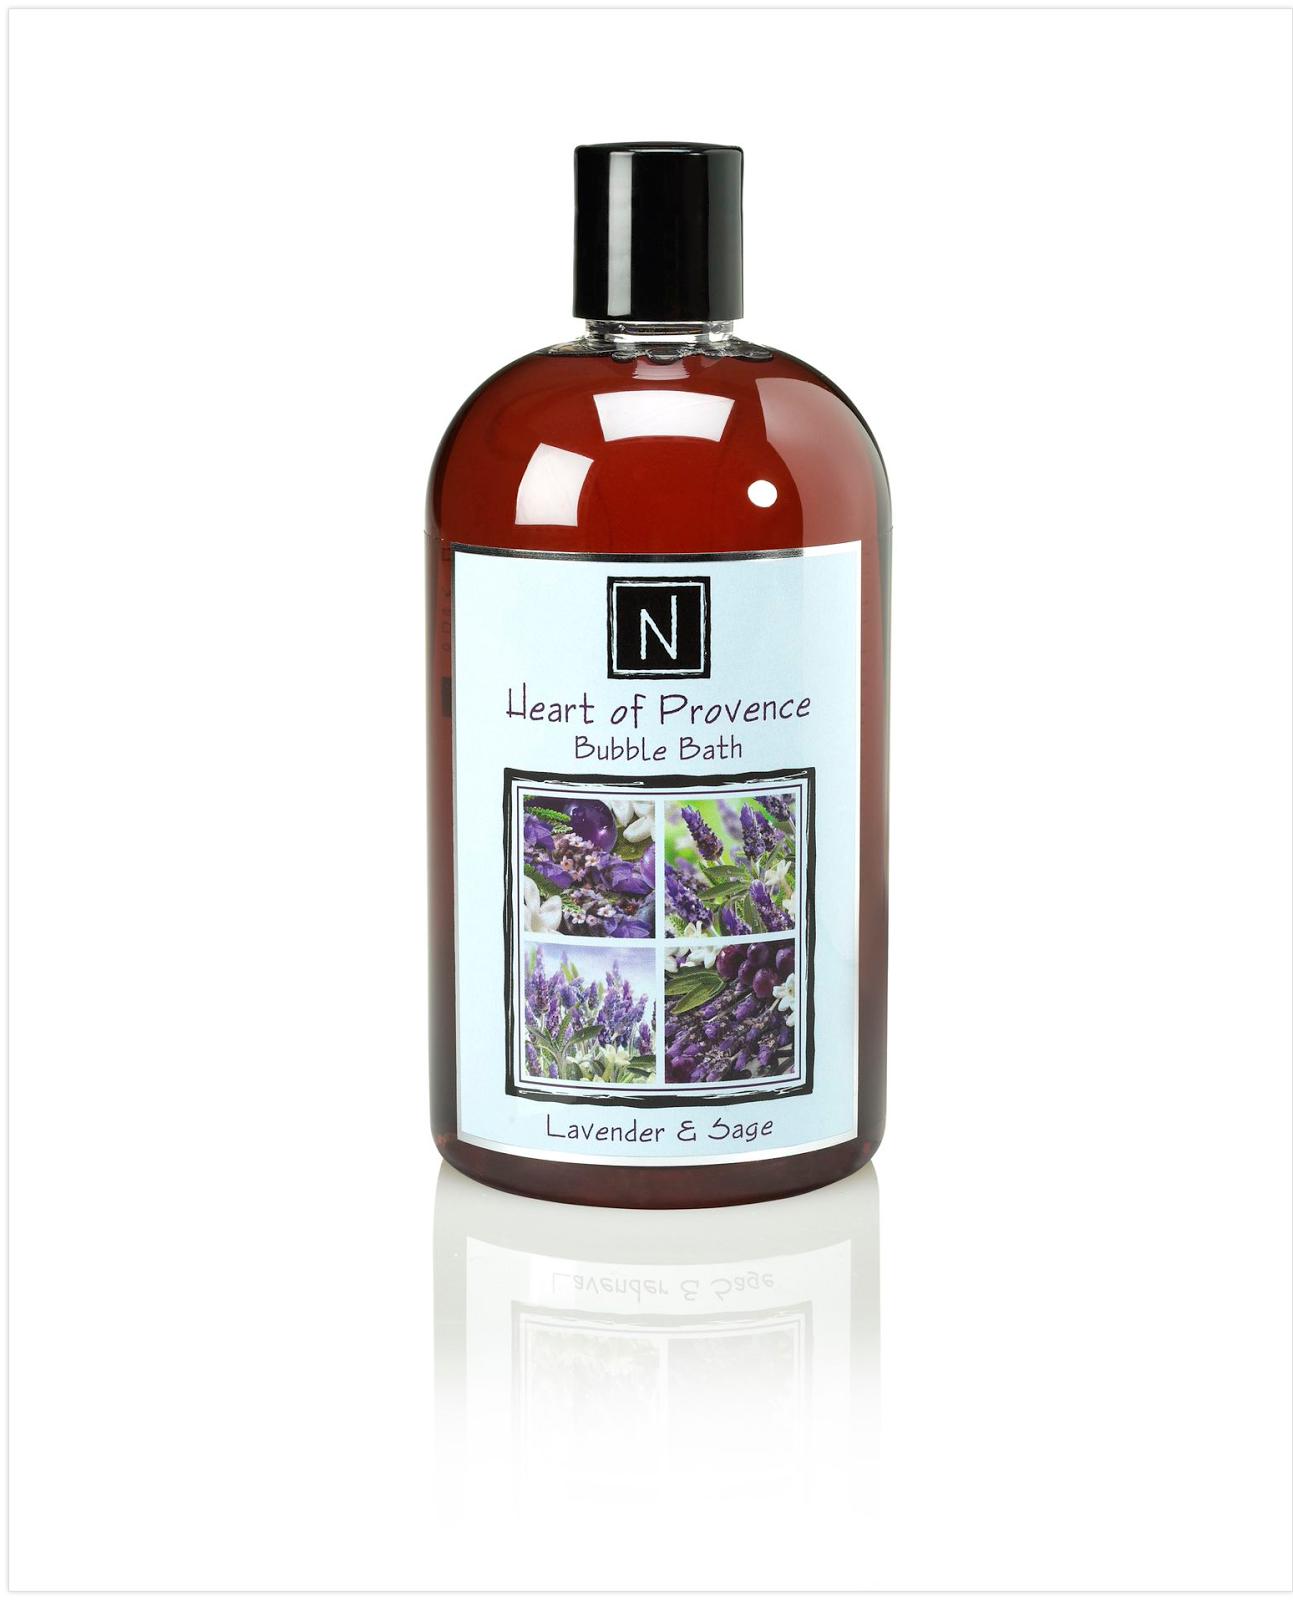 Engchik Eats NABILA K Bath Products Relax And Invigorate Your Senses